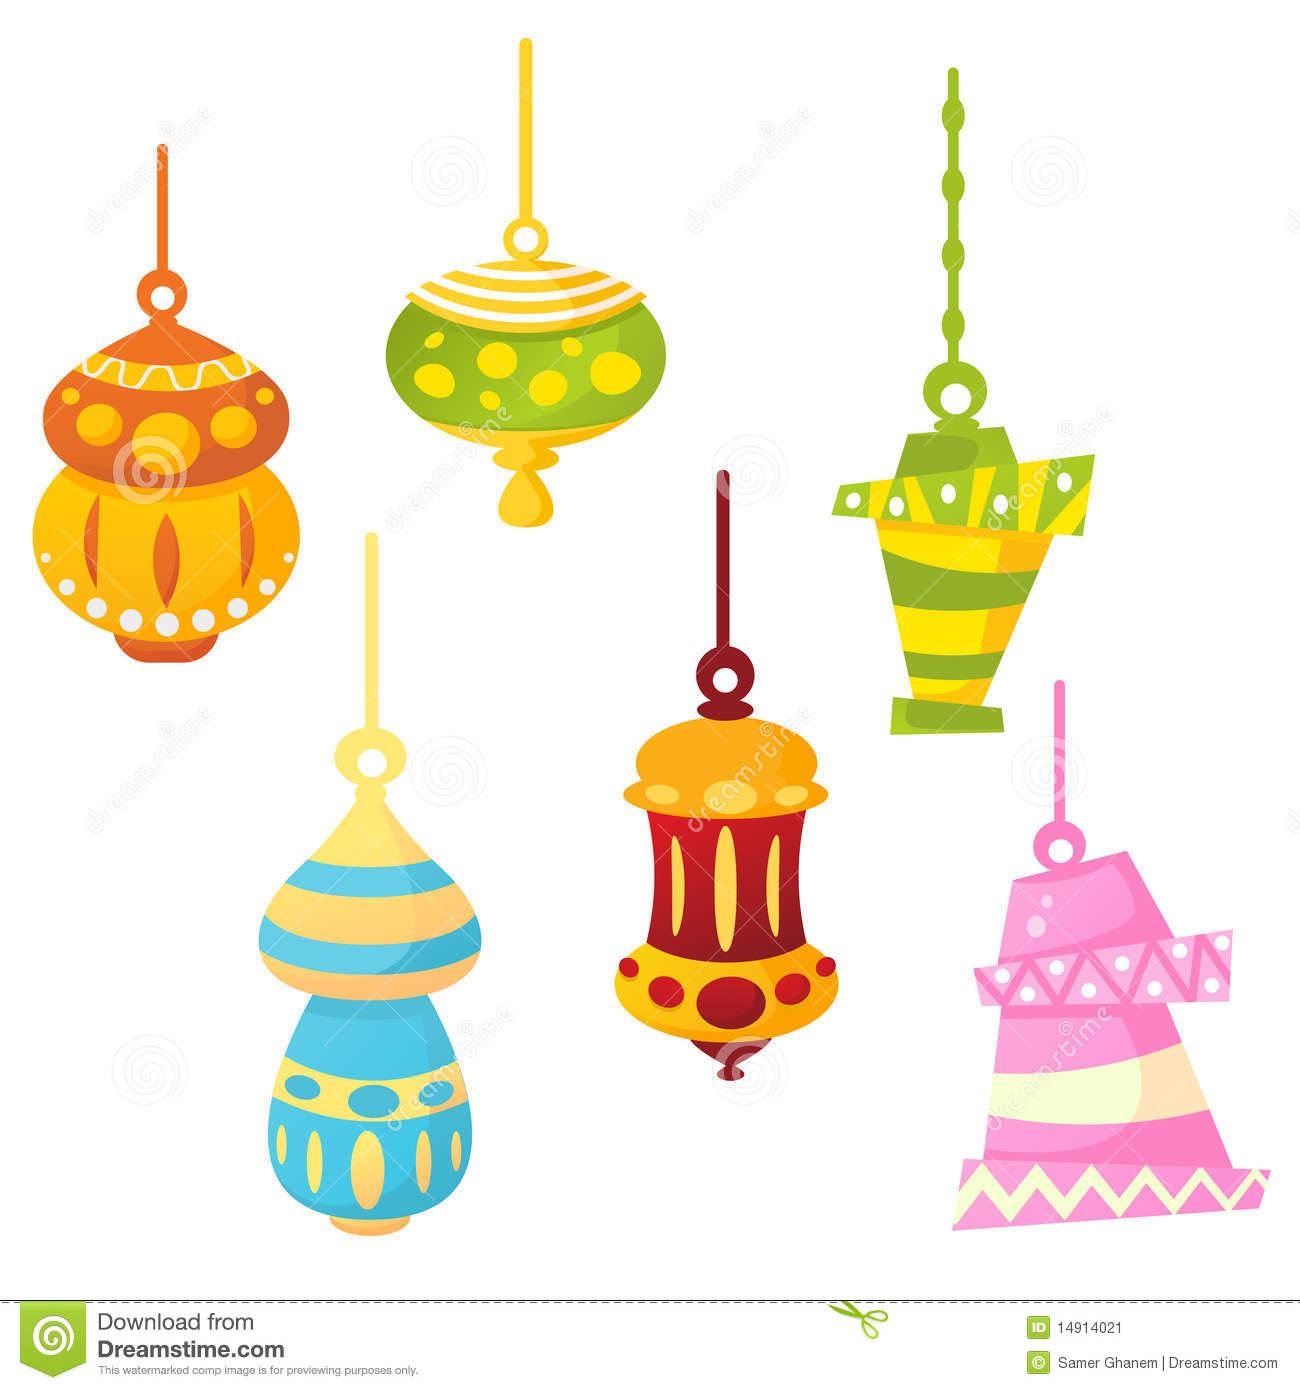 Ramzan cliparts png royalty free stock Ramadan Clipart   Clipart Panda - Free Clipart Images png royalty free stock